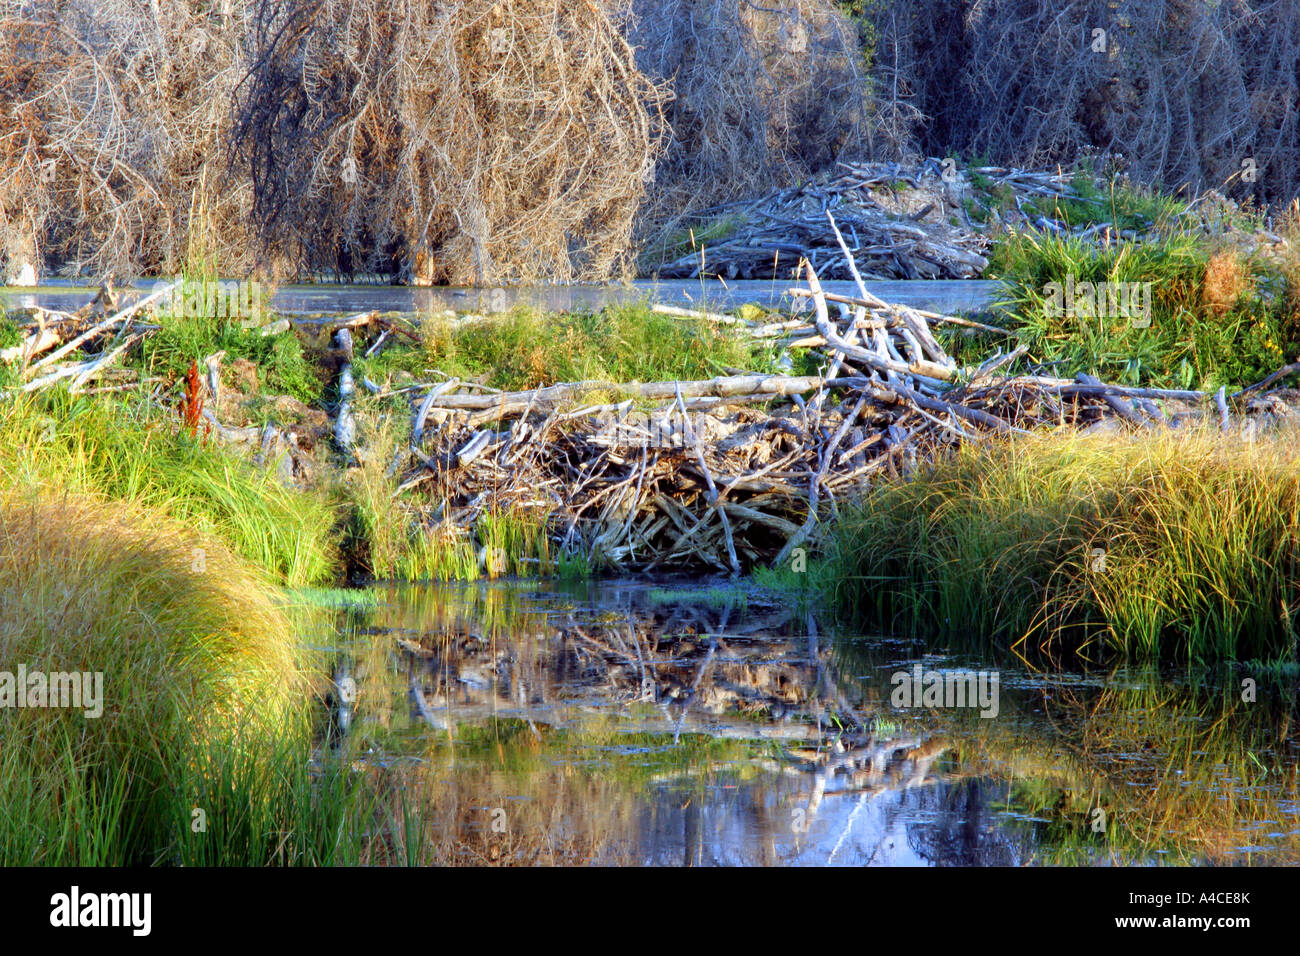 Beaver Dam y lodge, parque nacional Grand Teton Foto de stock